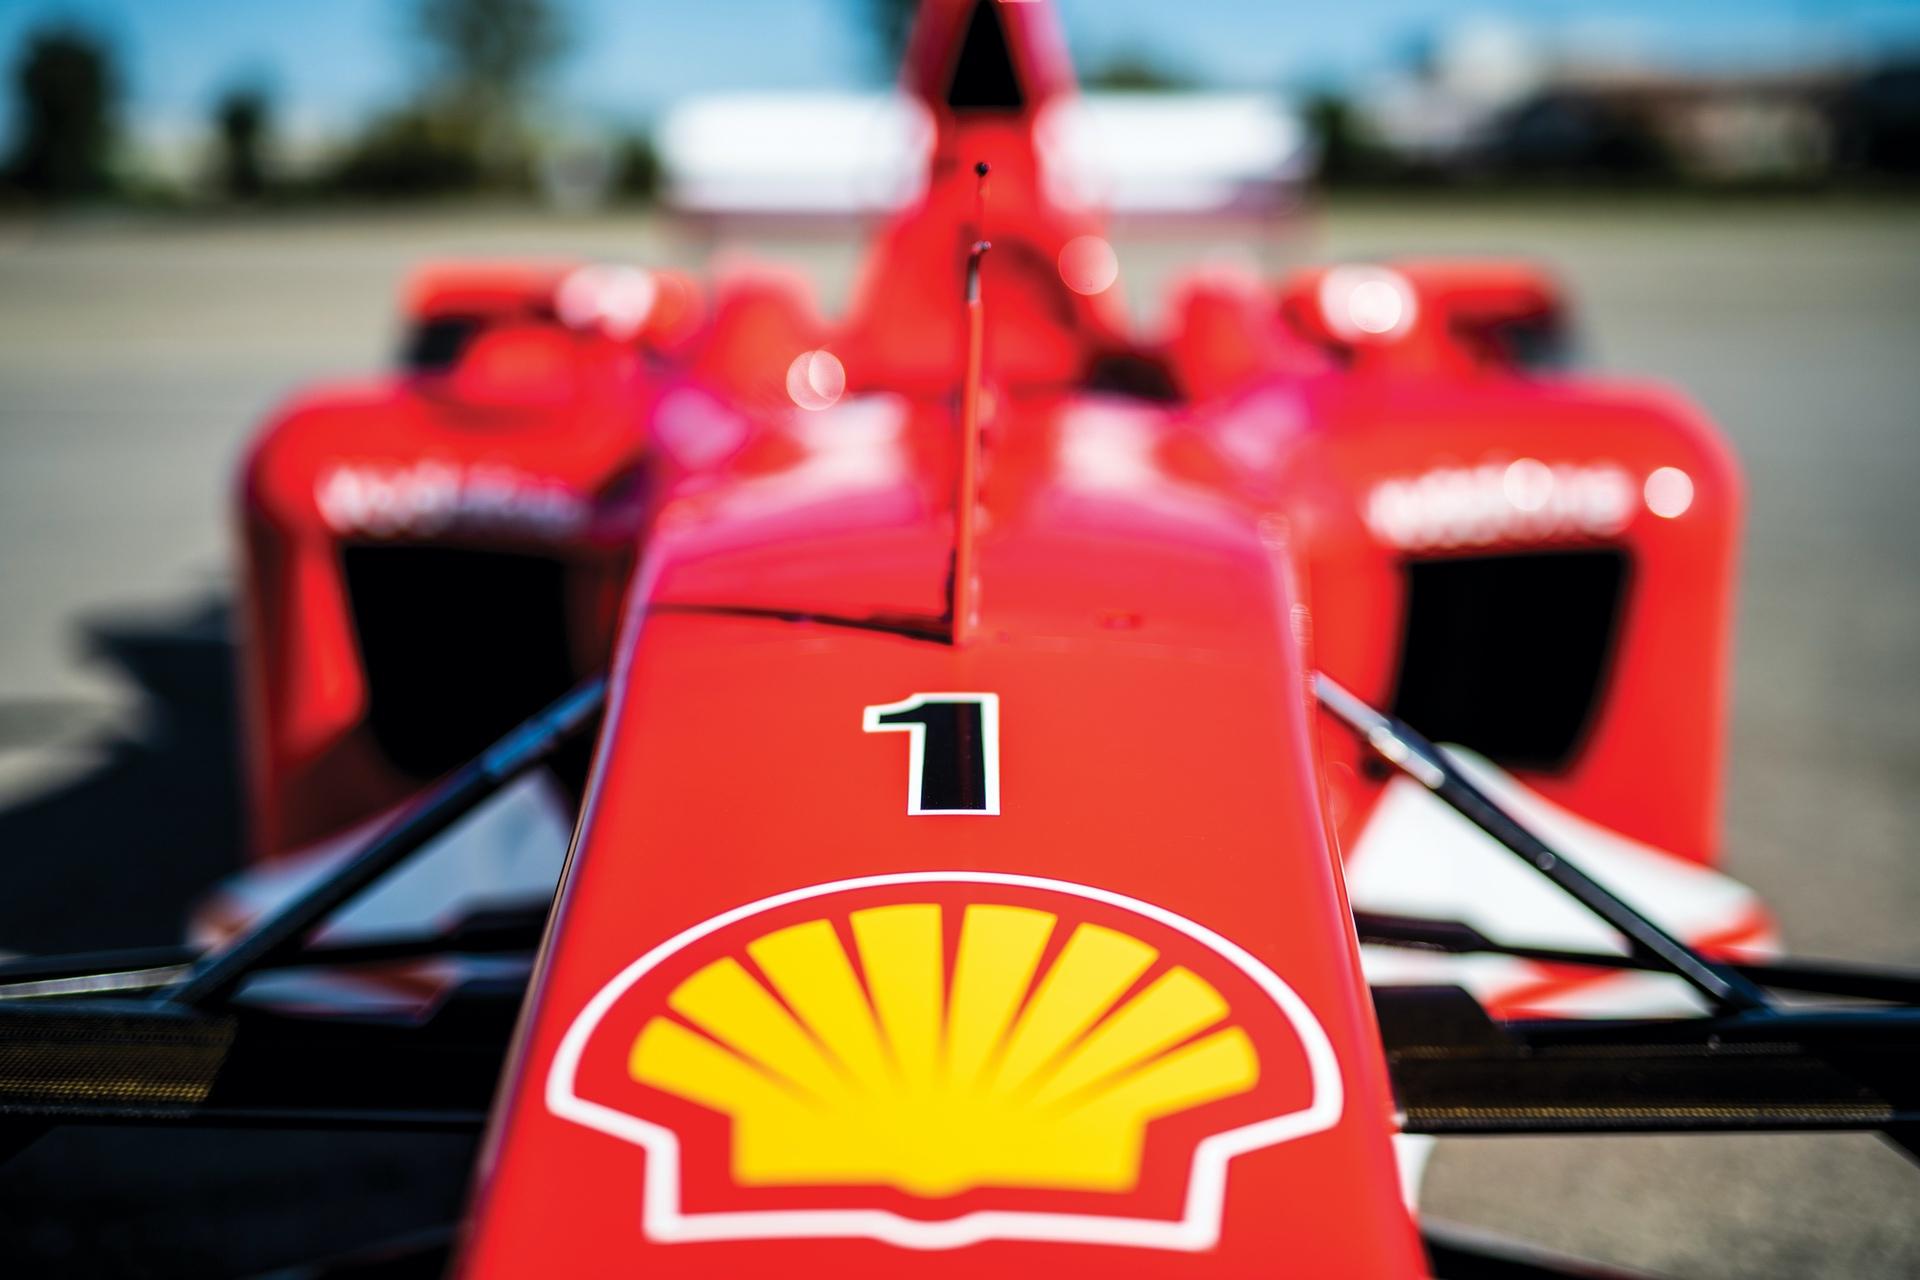 Mick_Schumacher_Ferrari_F2002_0022